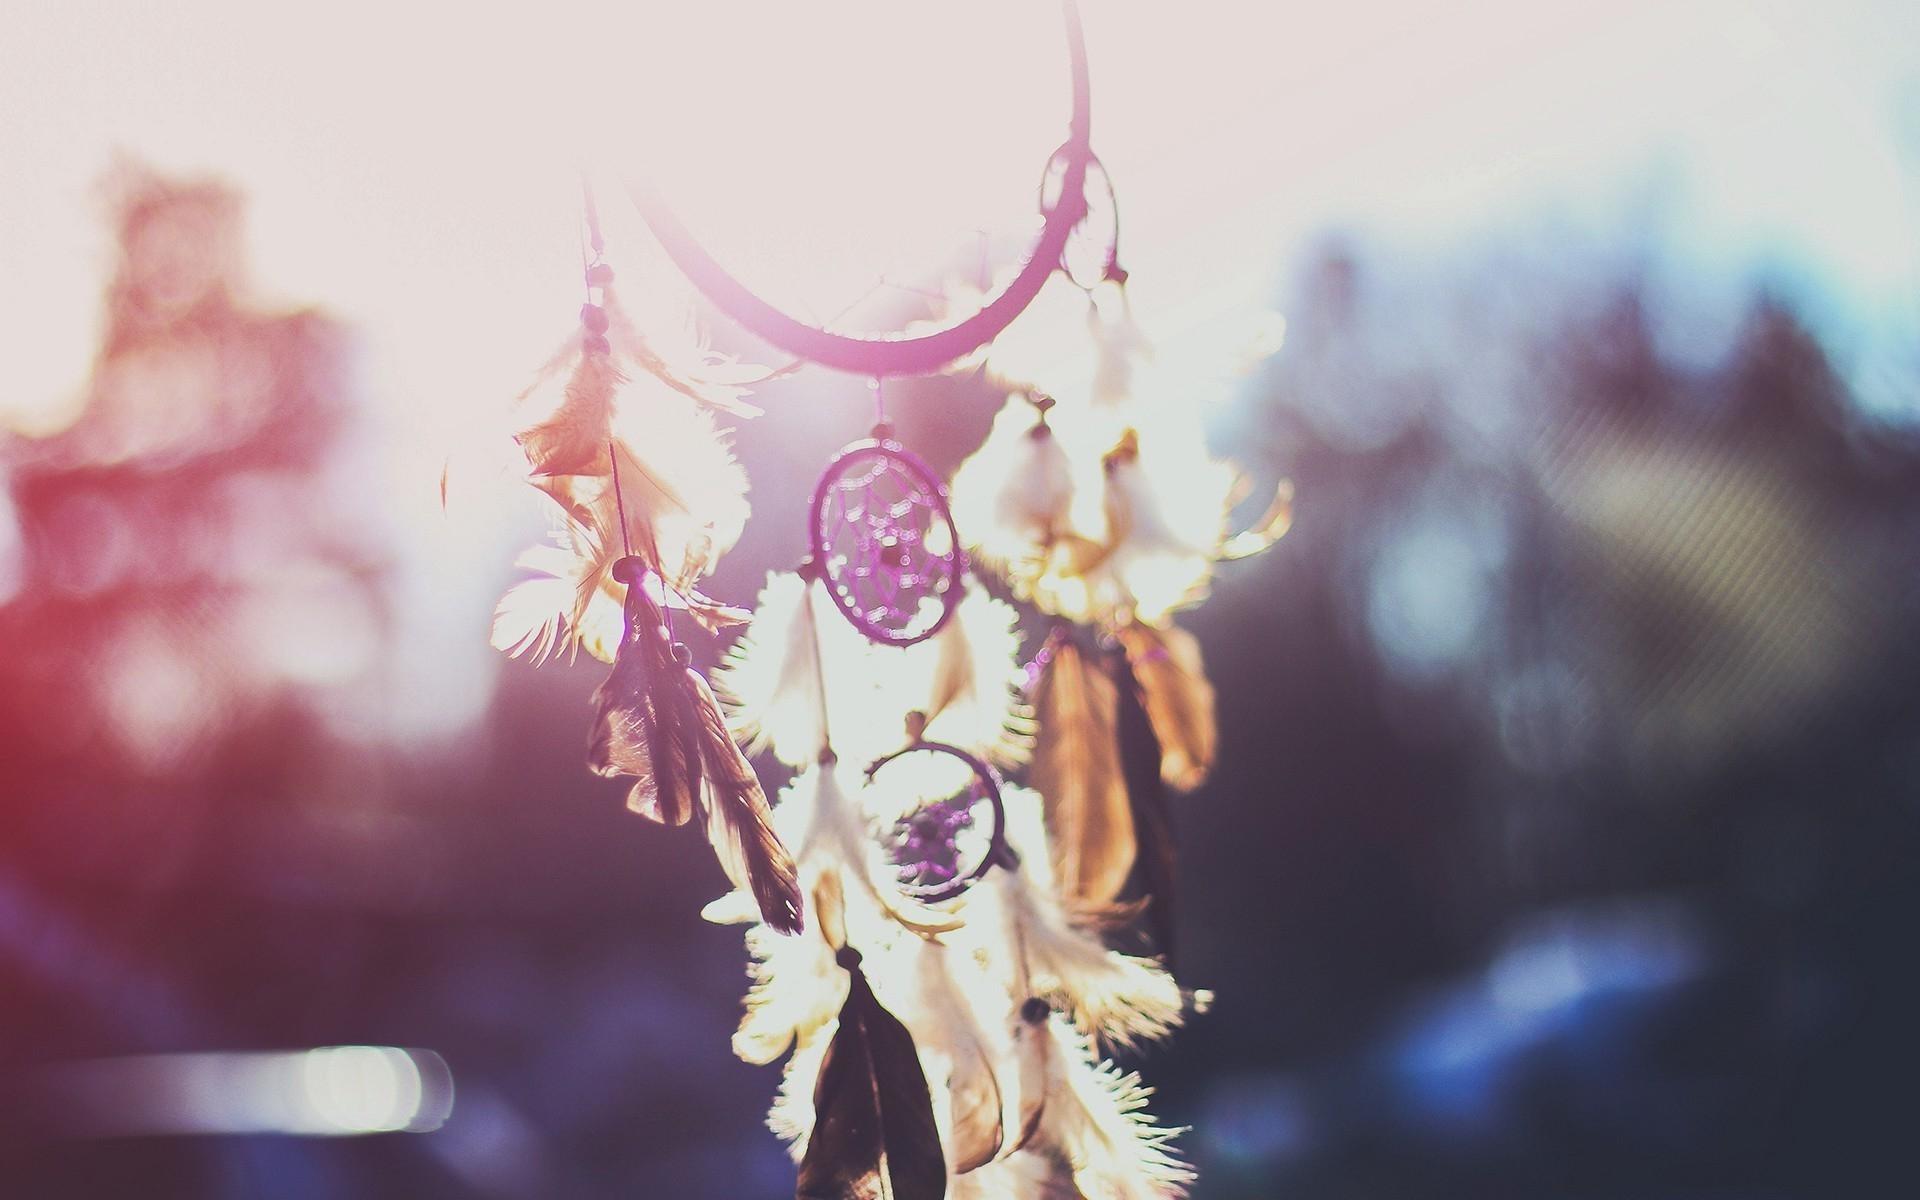 dreamcatcher tumblr background 183��